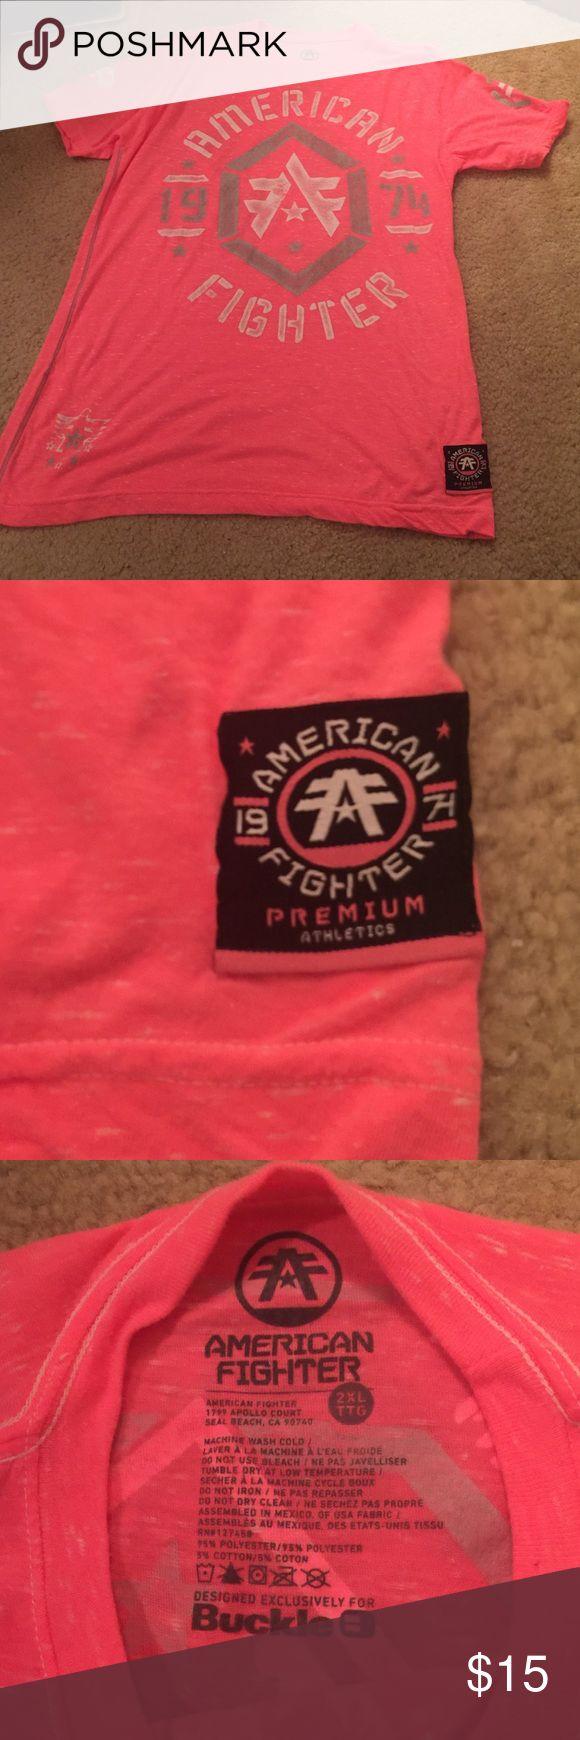 American Fighter 2XL logo neon pink/orange tee American Fighter 2XL logo neon pink/orange tee purchased from Buckle BuckleAmerican Fighter Shirts Tees - Short Sleeve